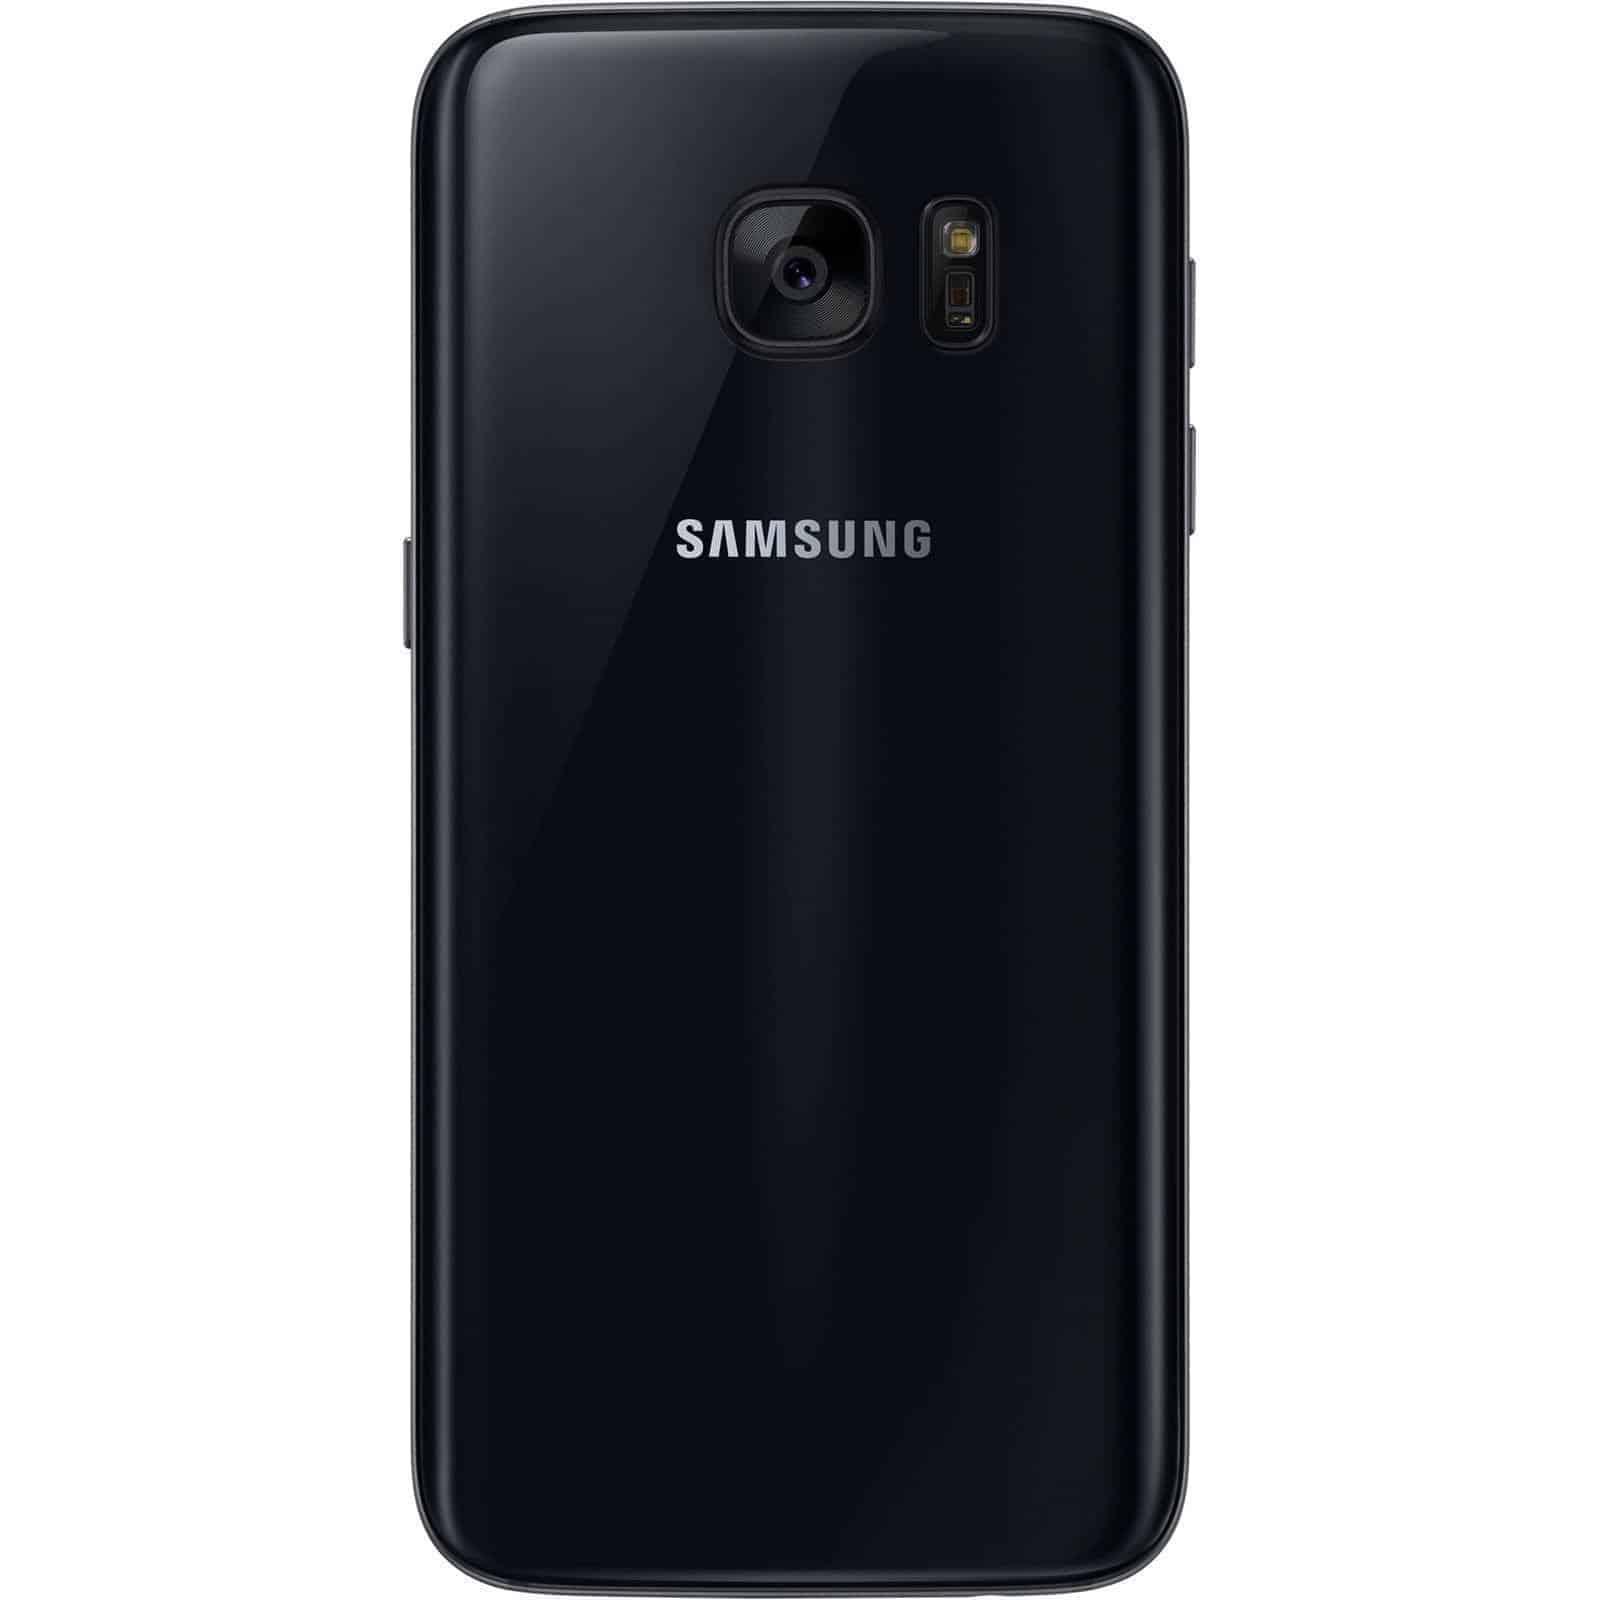 Galaxy S7 Deal 03